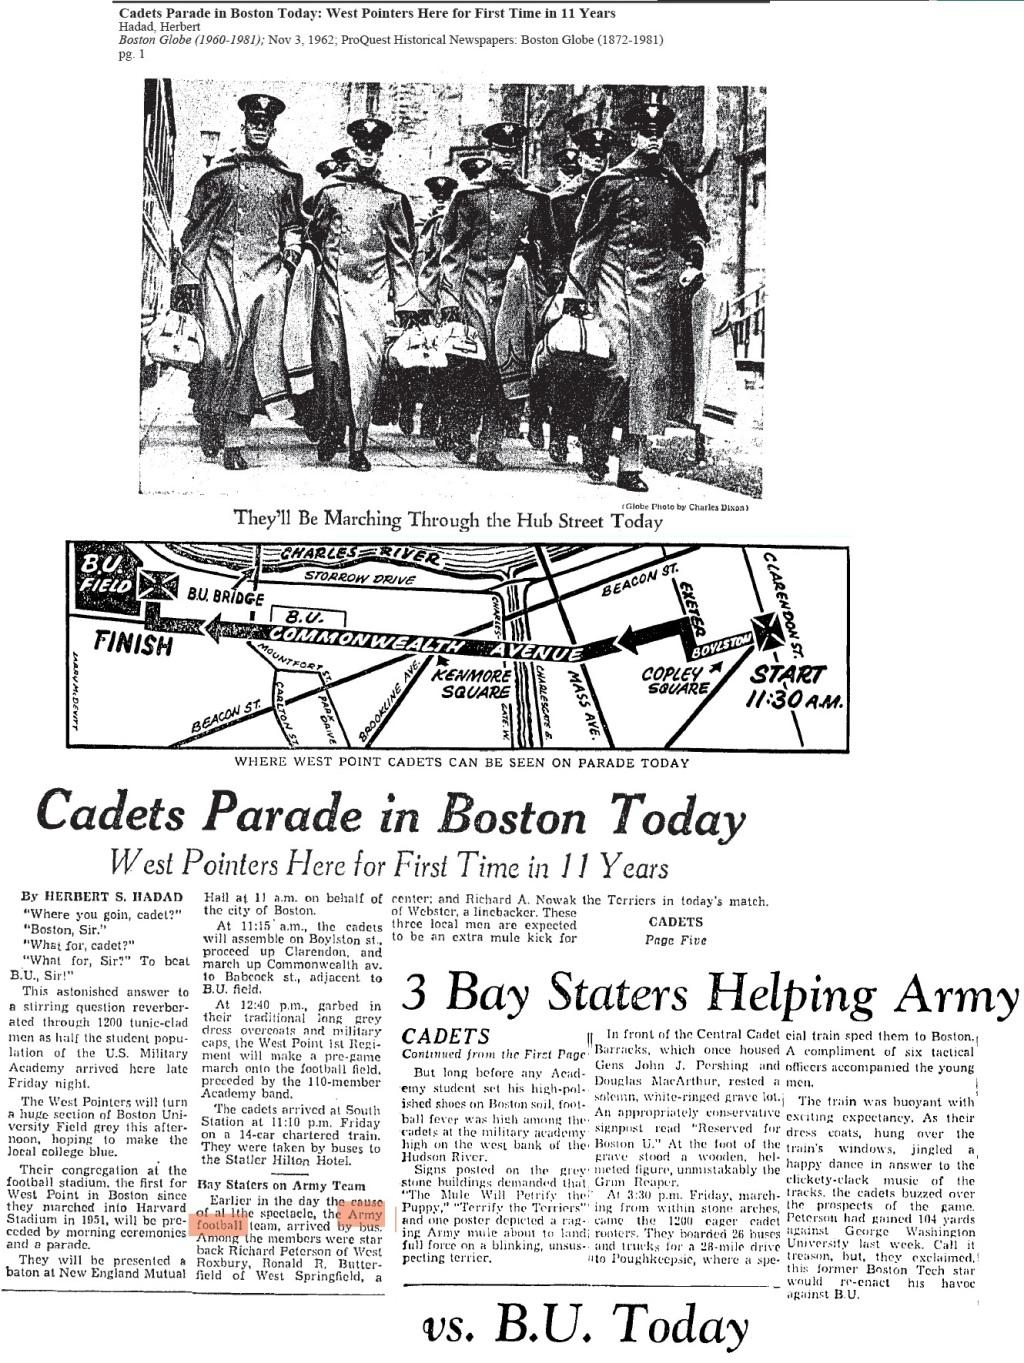 ArmyFB_1962_vsBU-BeantownParade_BostonGlobe_Nov31962